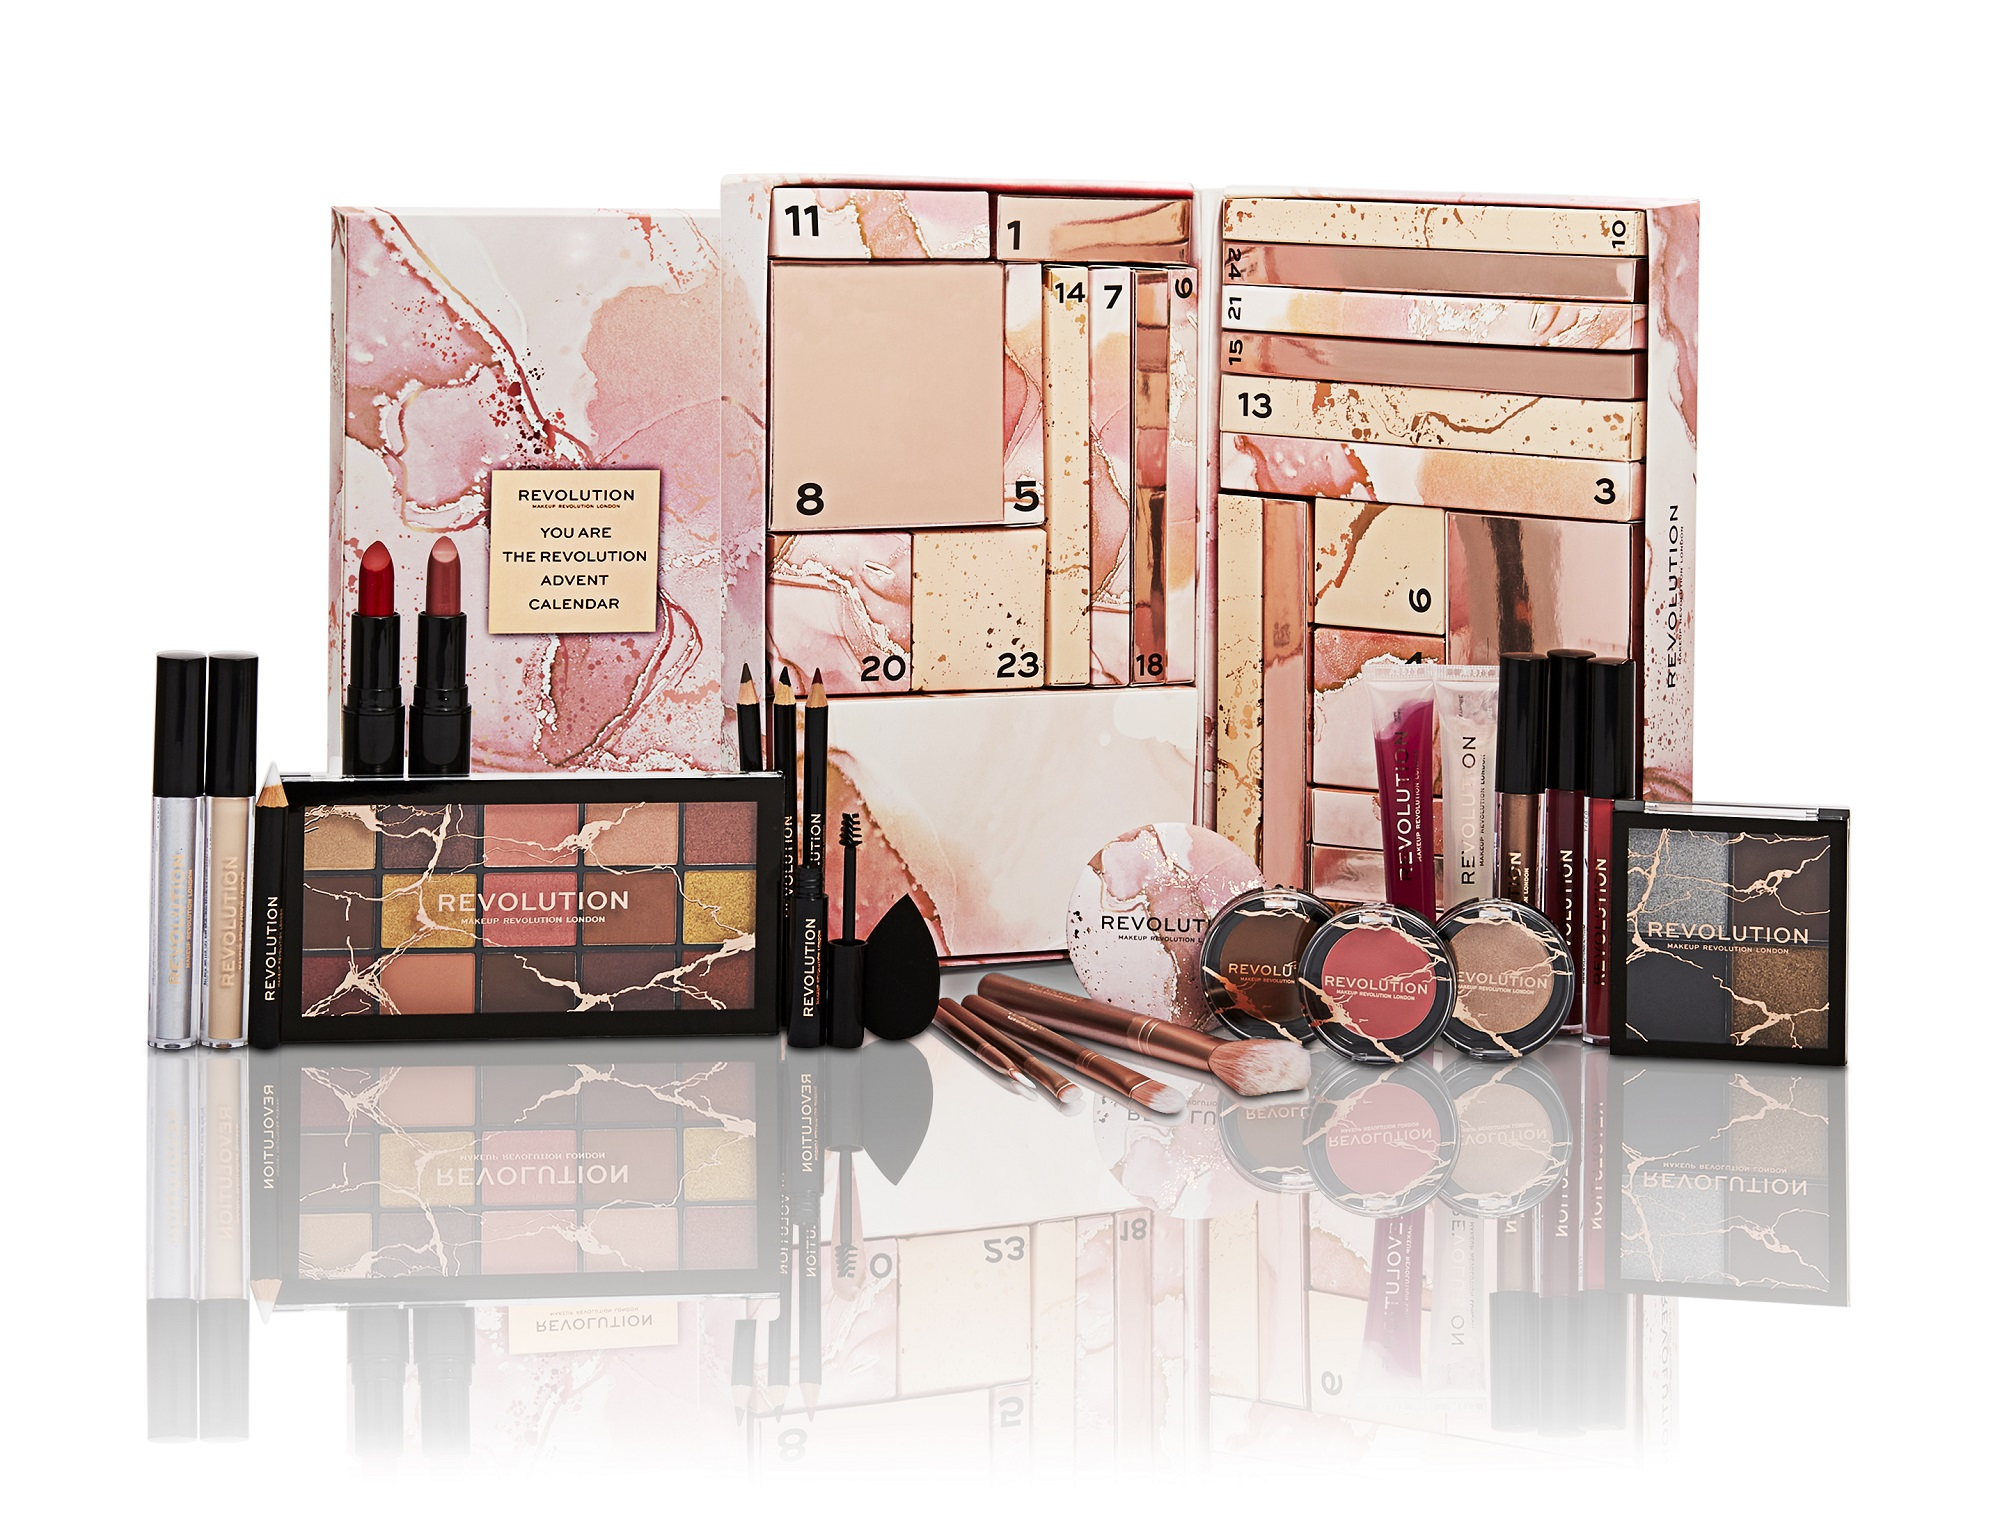 Makeup Revolution You Are The Revolution Advent Calendar 2021 Adventní kalendář s 25 kosmetickými do